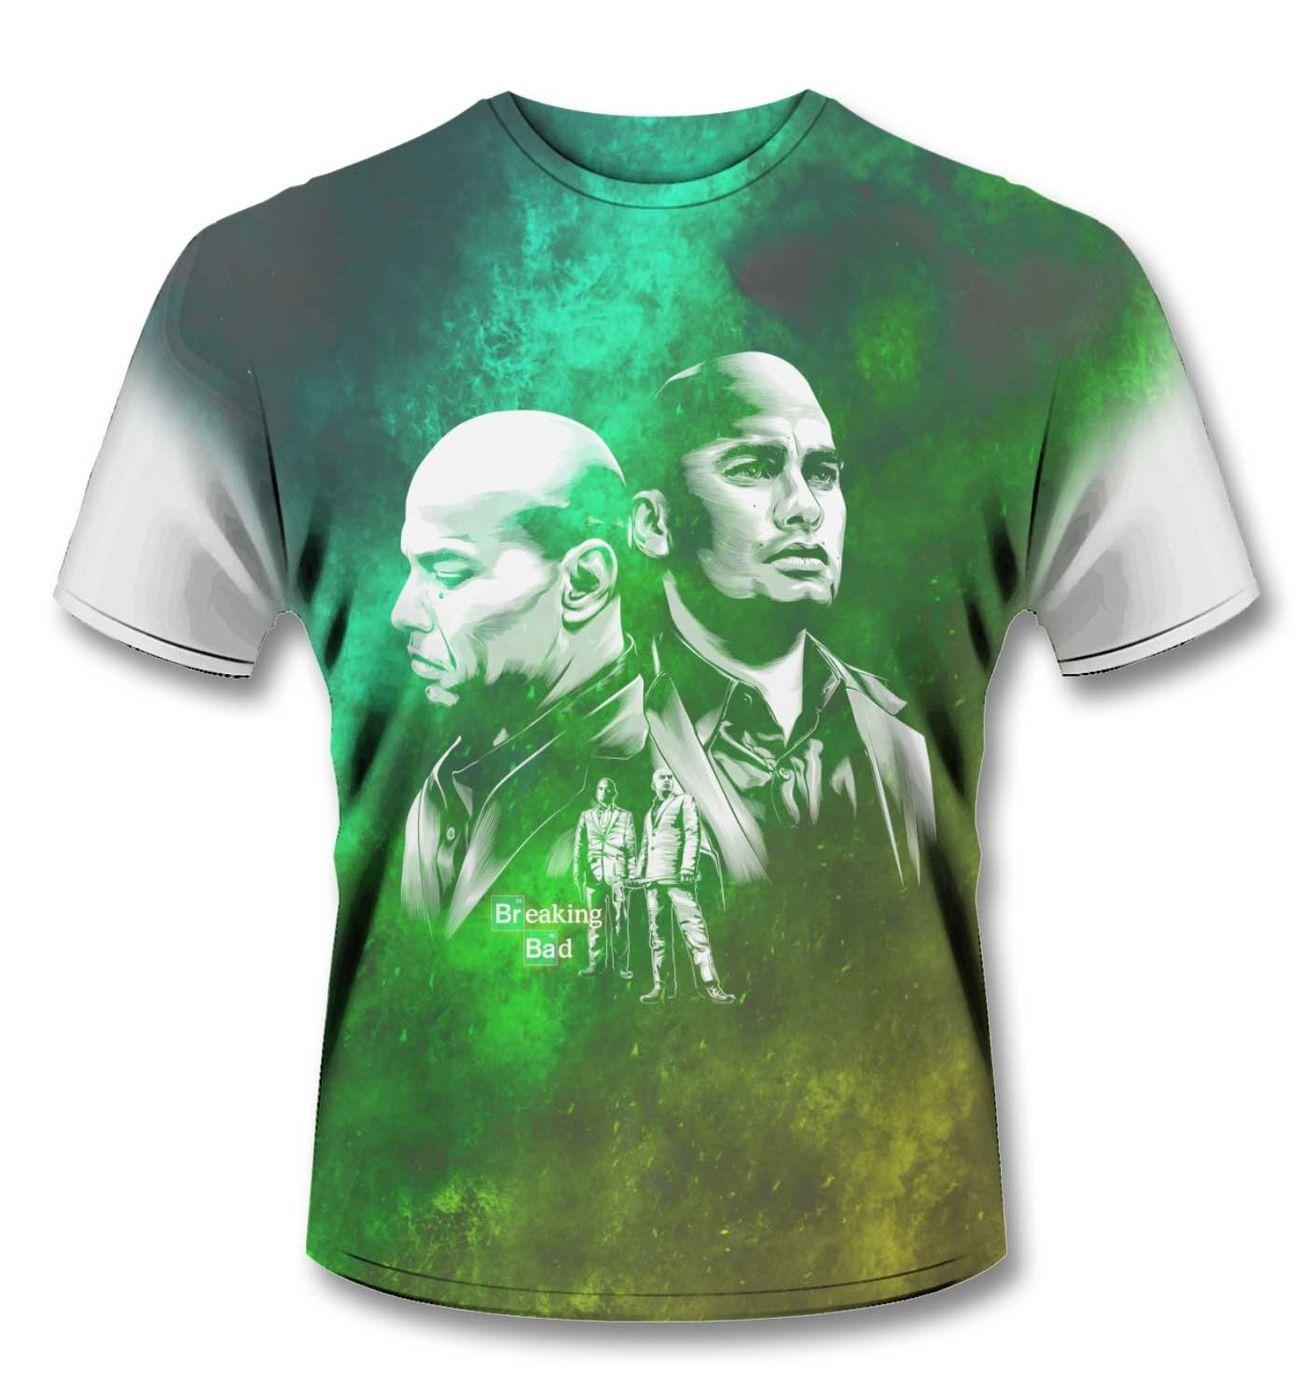 Official Breaking Bad SubDye Los Primos t-shirt